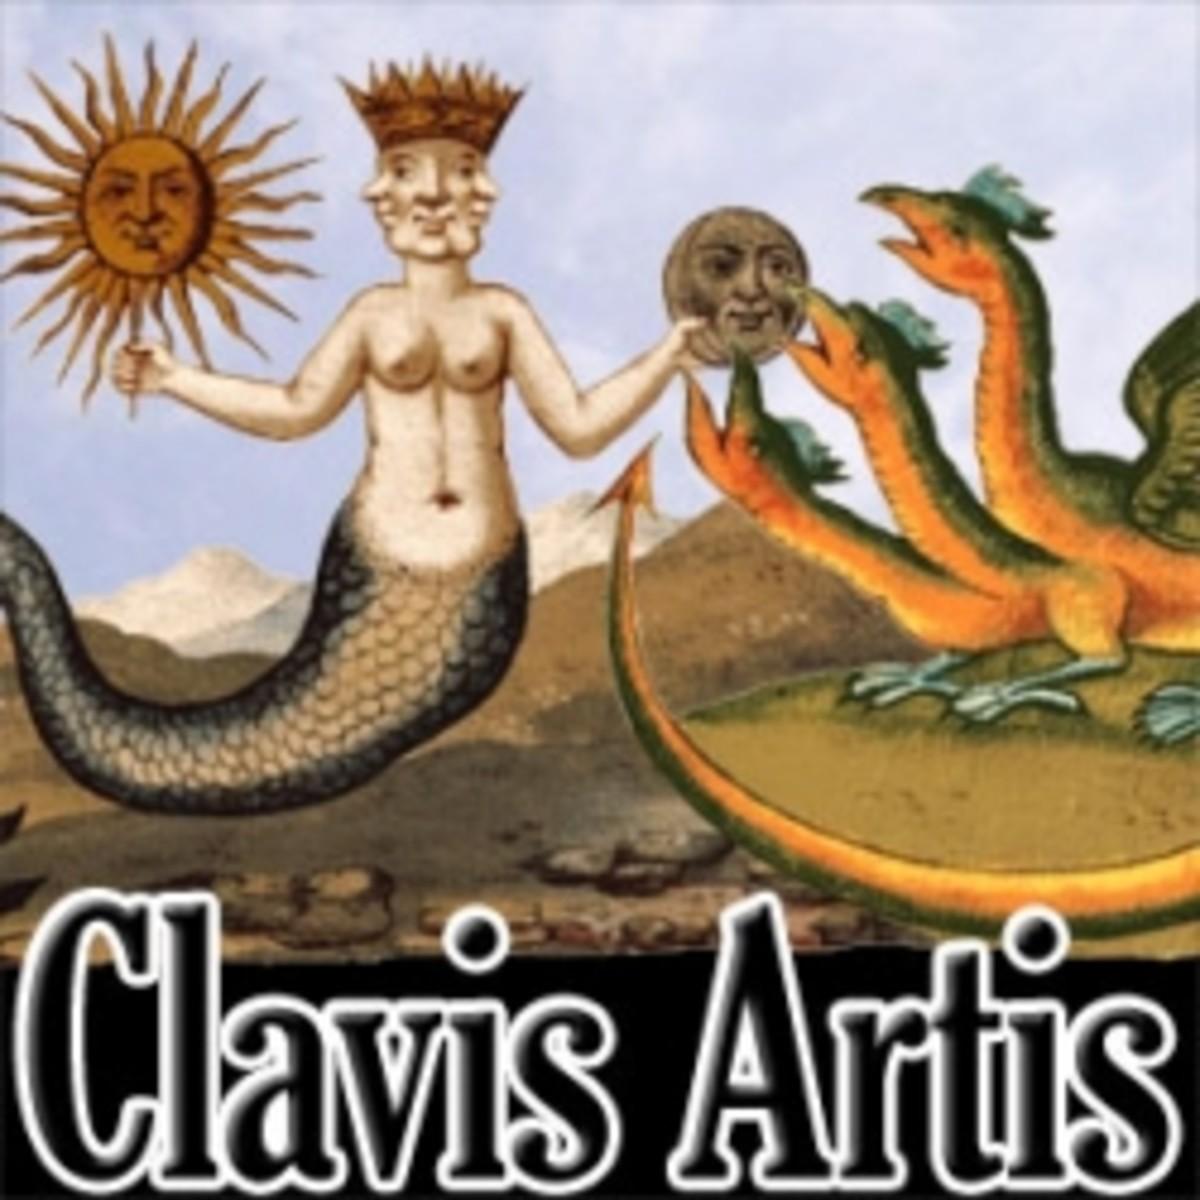 Clavis Artis